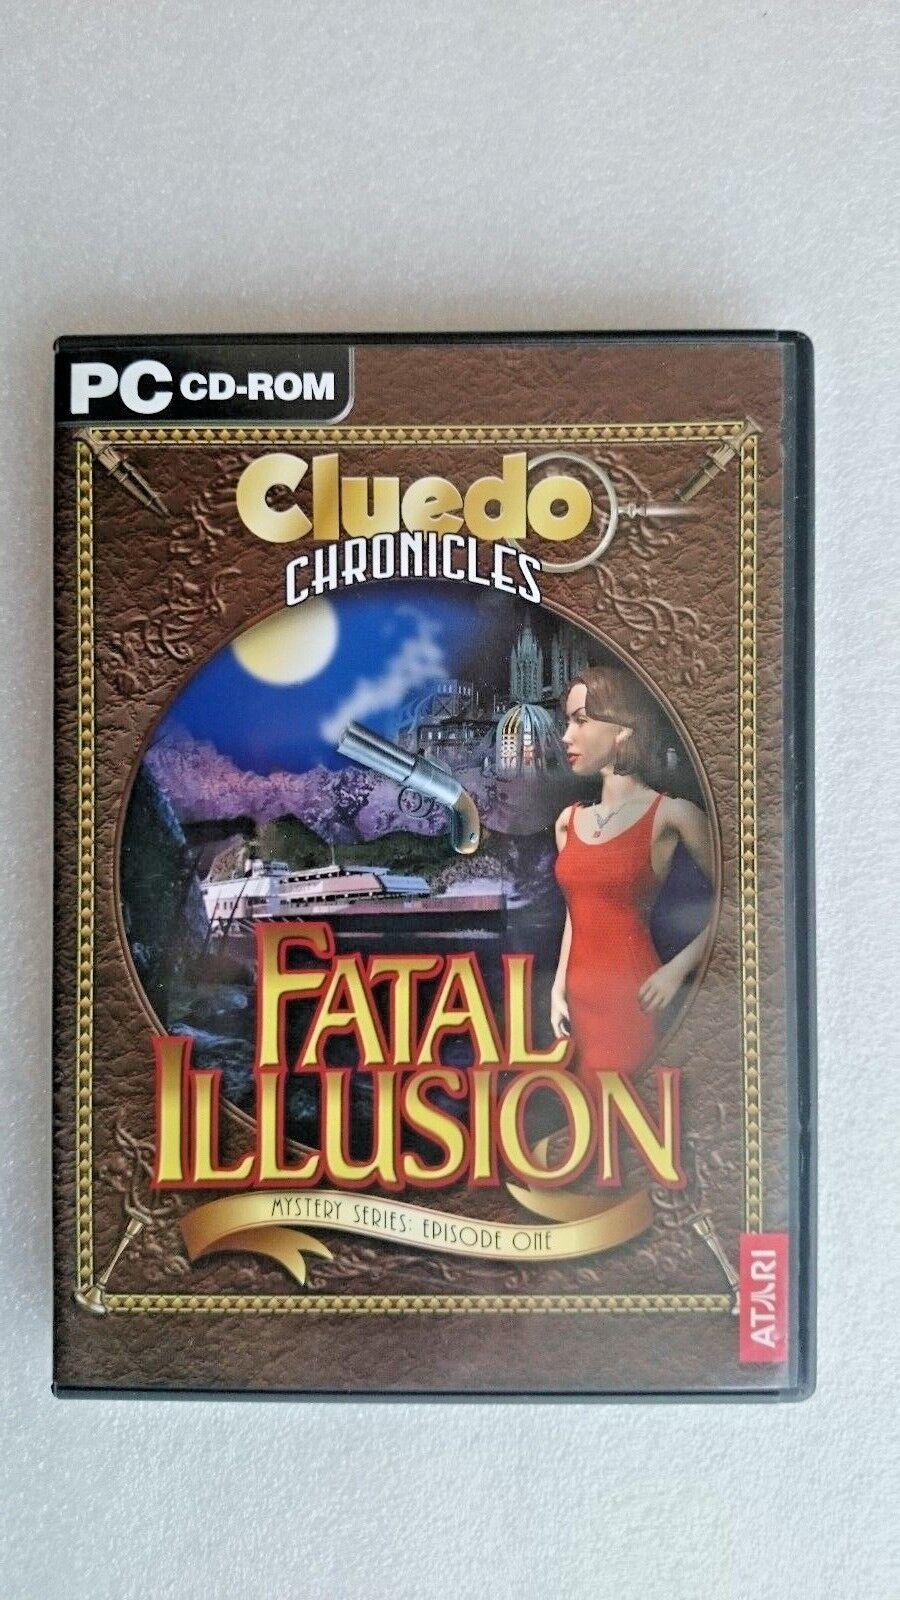 Cluedo  Chronicles - Fatal Illusion  (PC Windows  2004) - Original Release